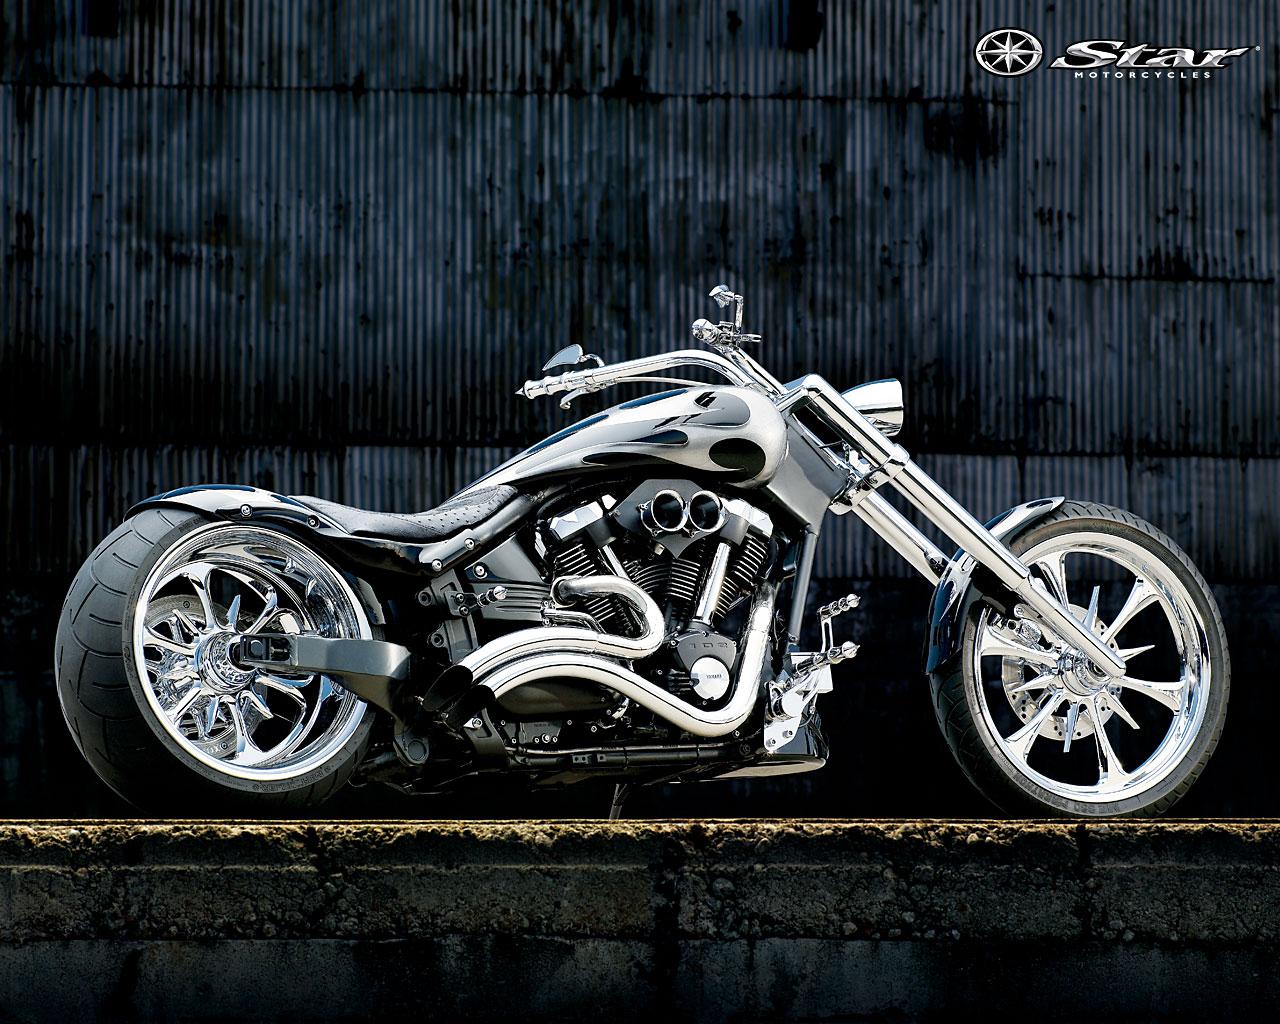 Free Download Yamaha Chopper Chrome Wallpaper 1280x1024